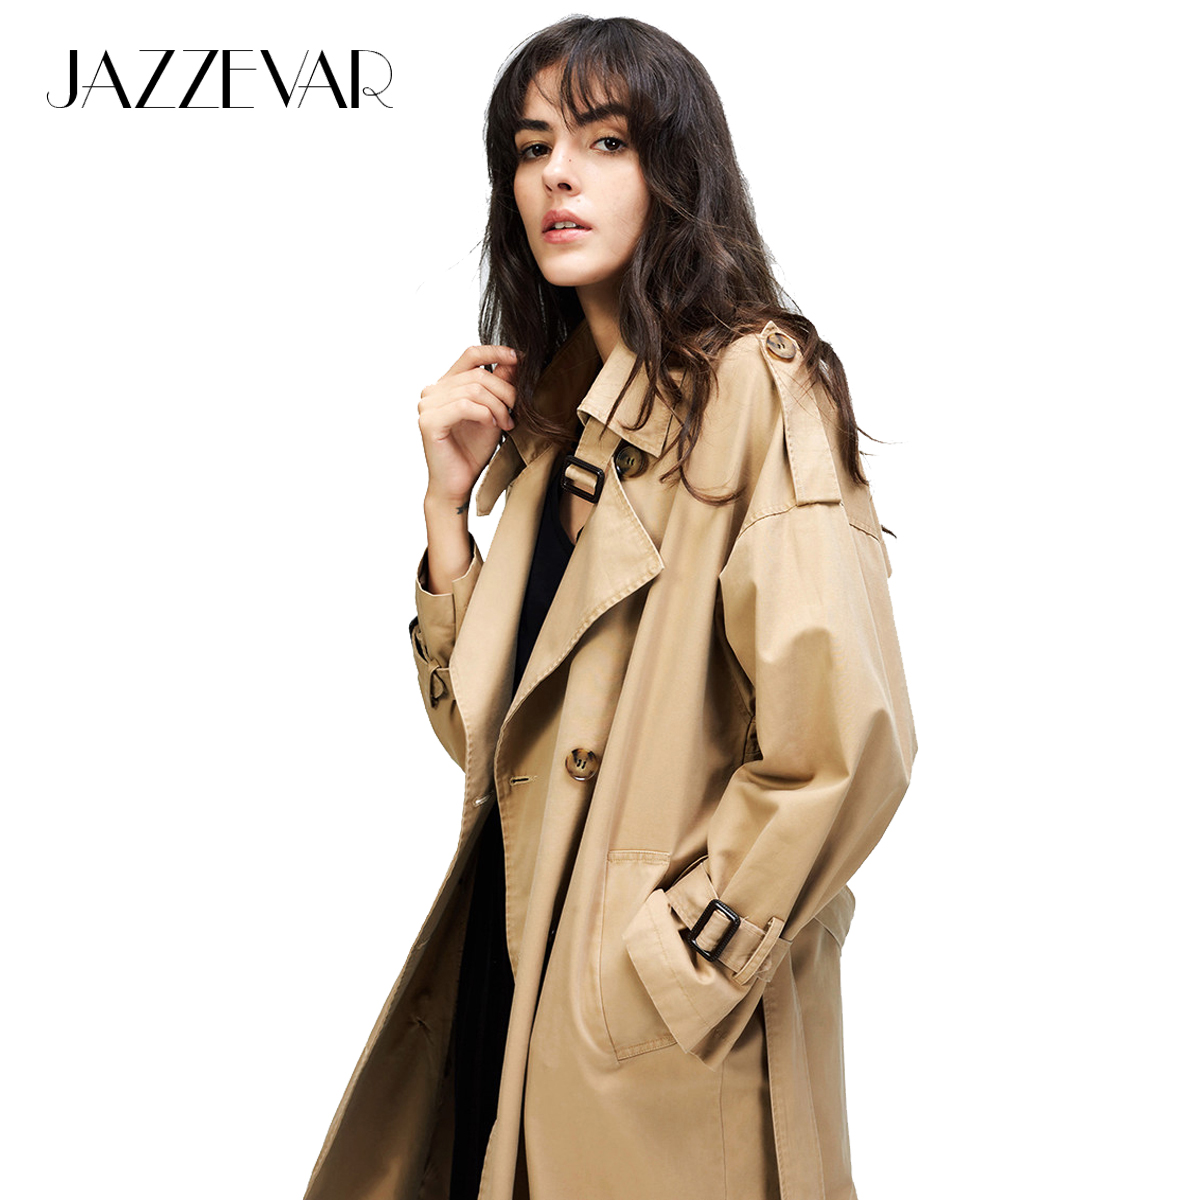 JAZZEVAR 2019 Outono Nova das Mulheres trench coat Casual oversize Double Breasted Outwear Roupas Soltas Do Vintage Lavado